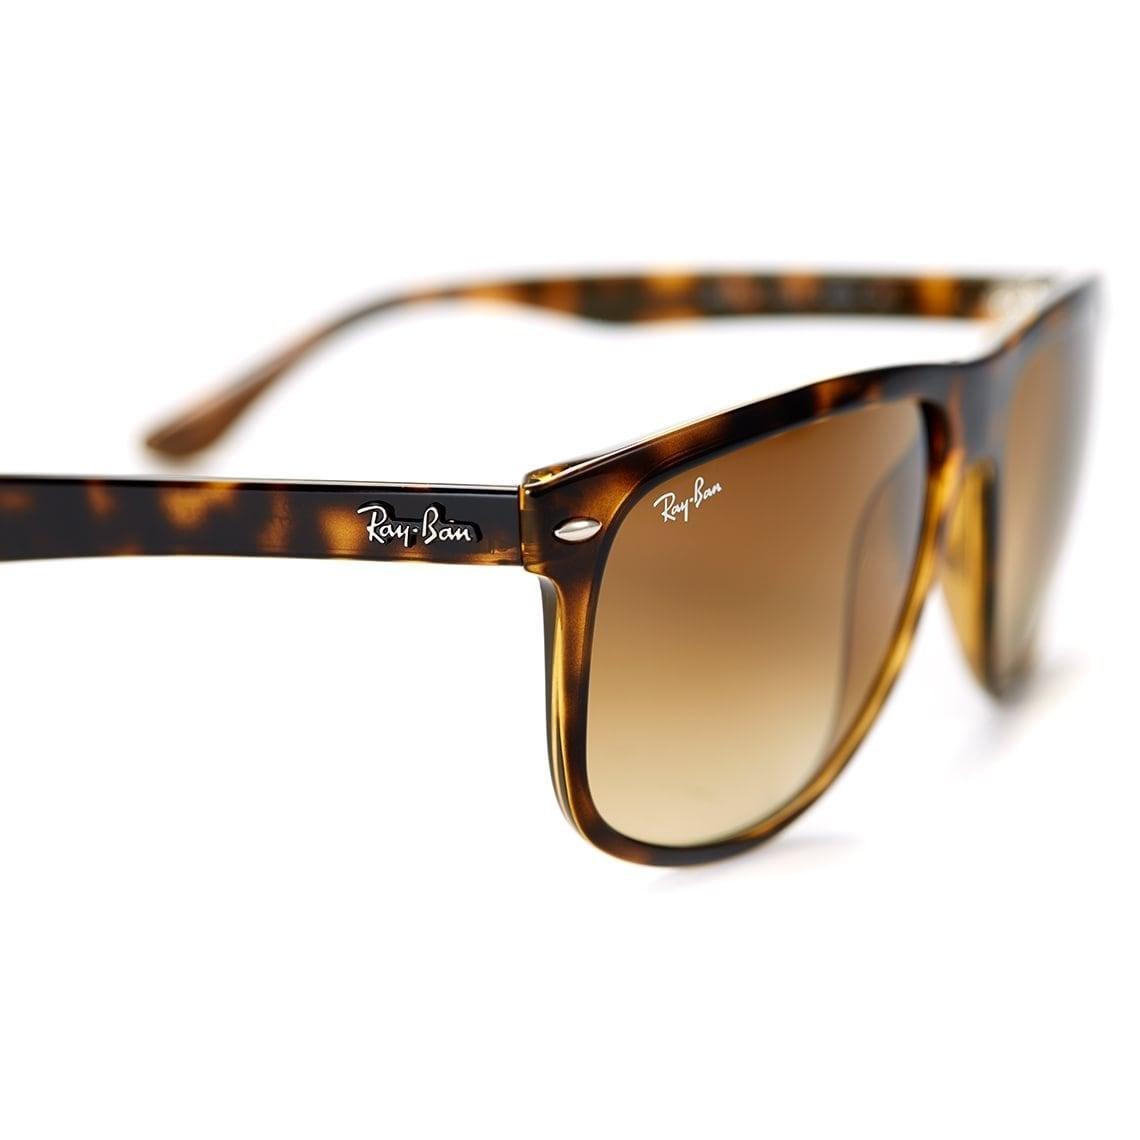 10a826c2675 ... greece shop ray ban rb4147 710 51 tortoise frame light brown gradient  60mm lens sunglasses free